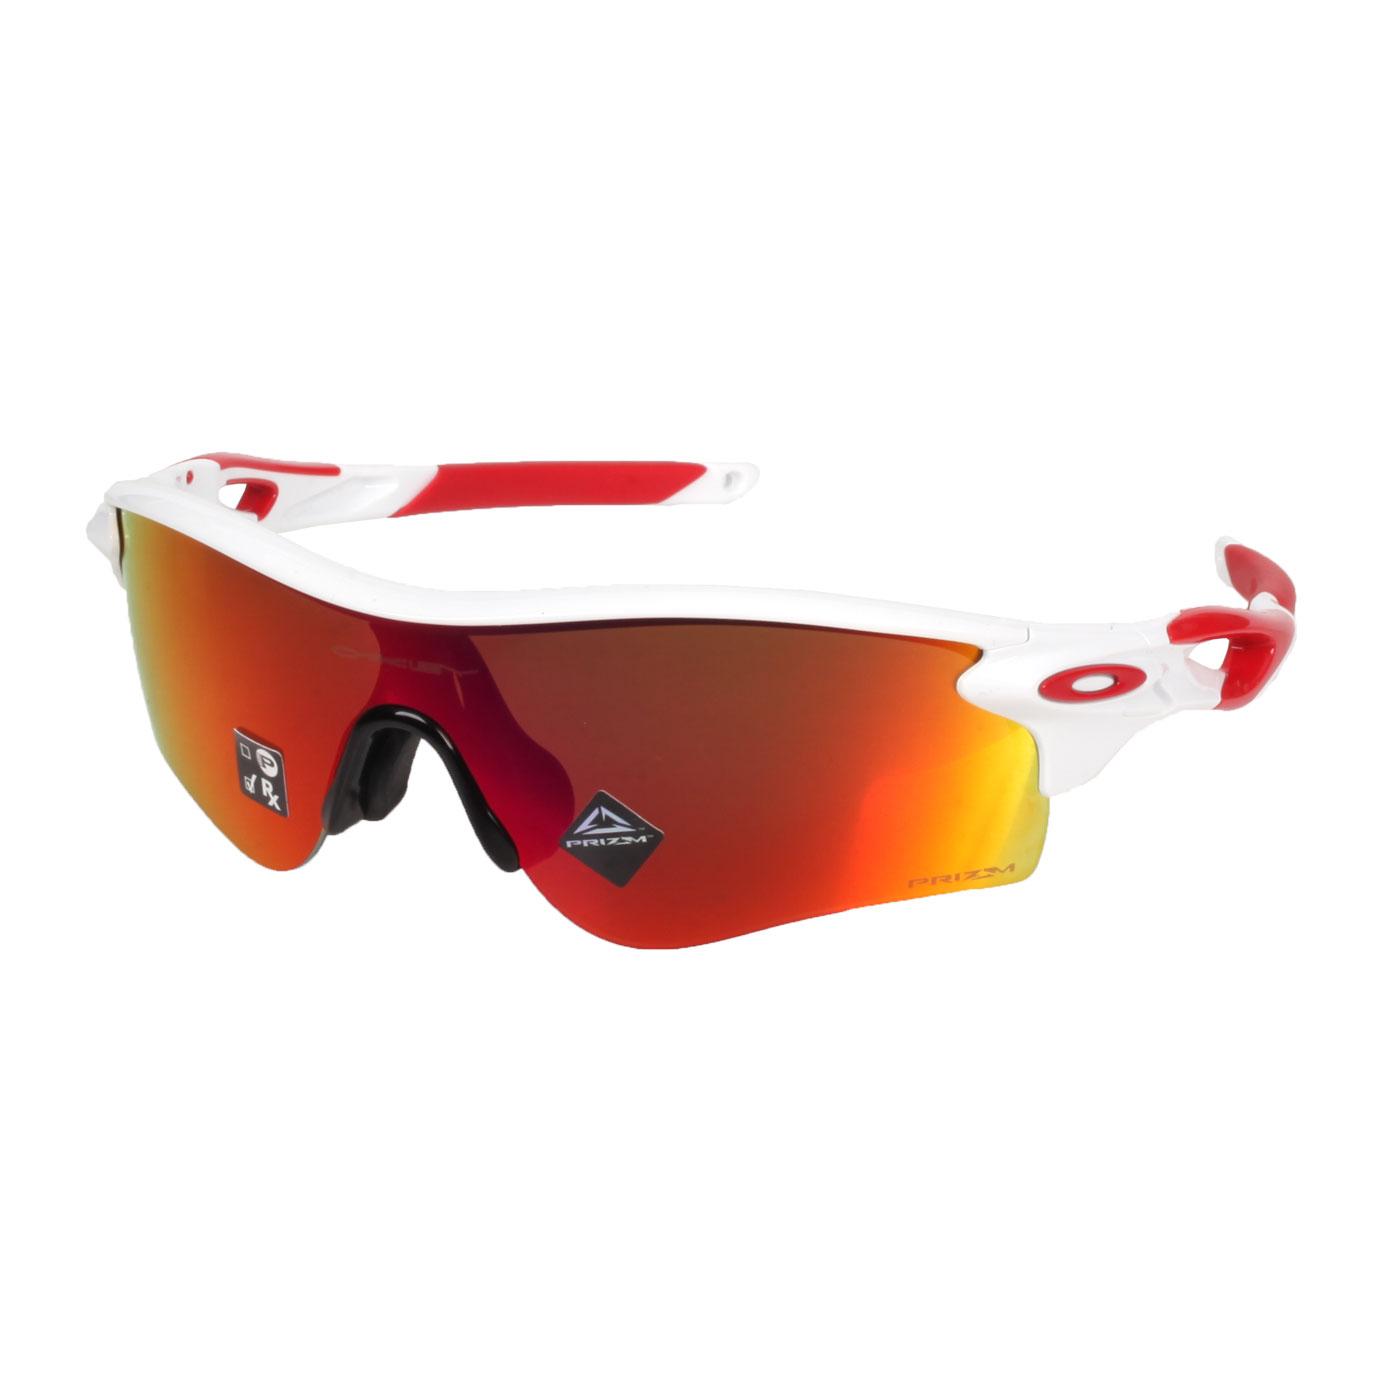 OAKLEY RADARLOCK PATH 一般太陽眼鏡(附硬盒鼻墊) OAK-OO9206-4638